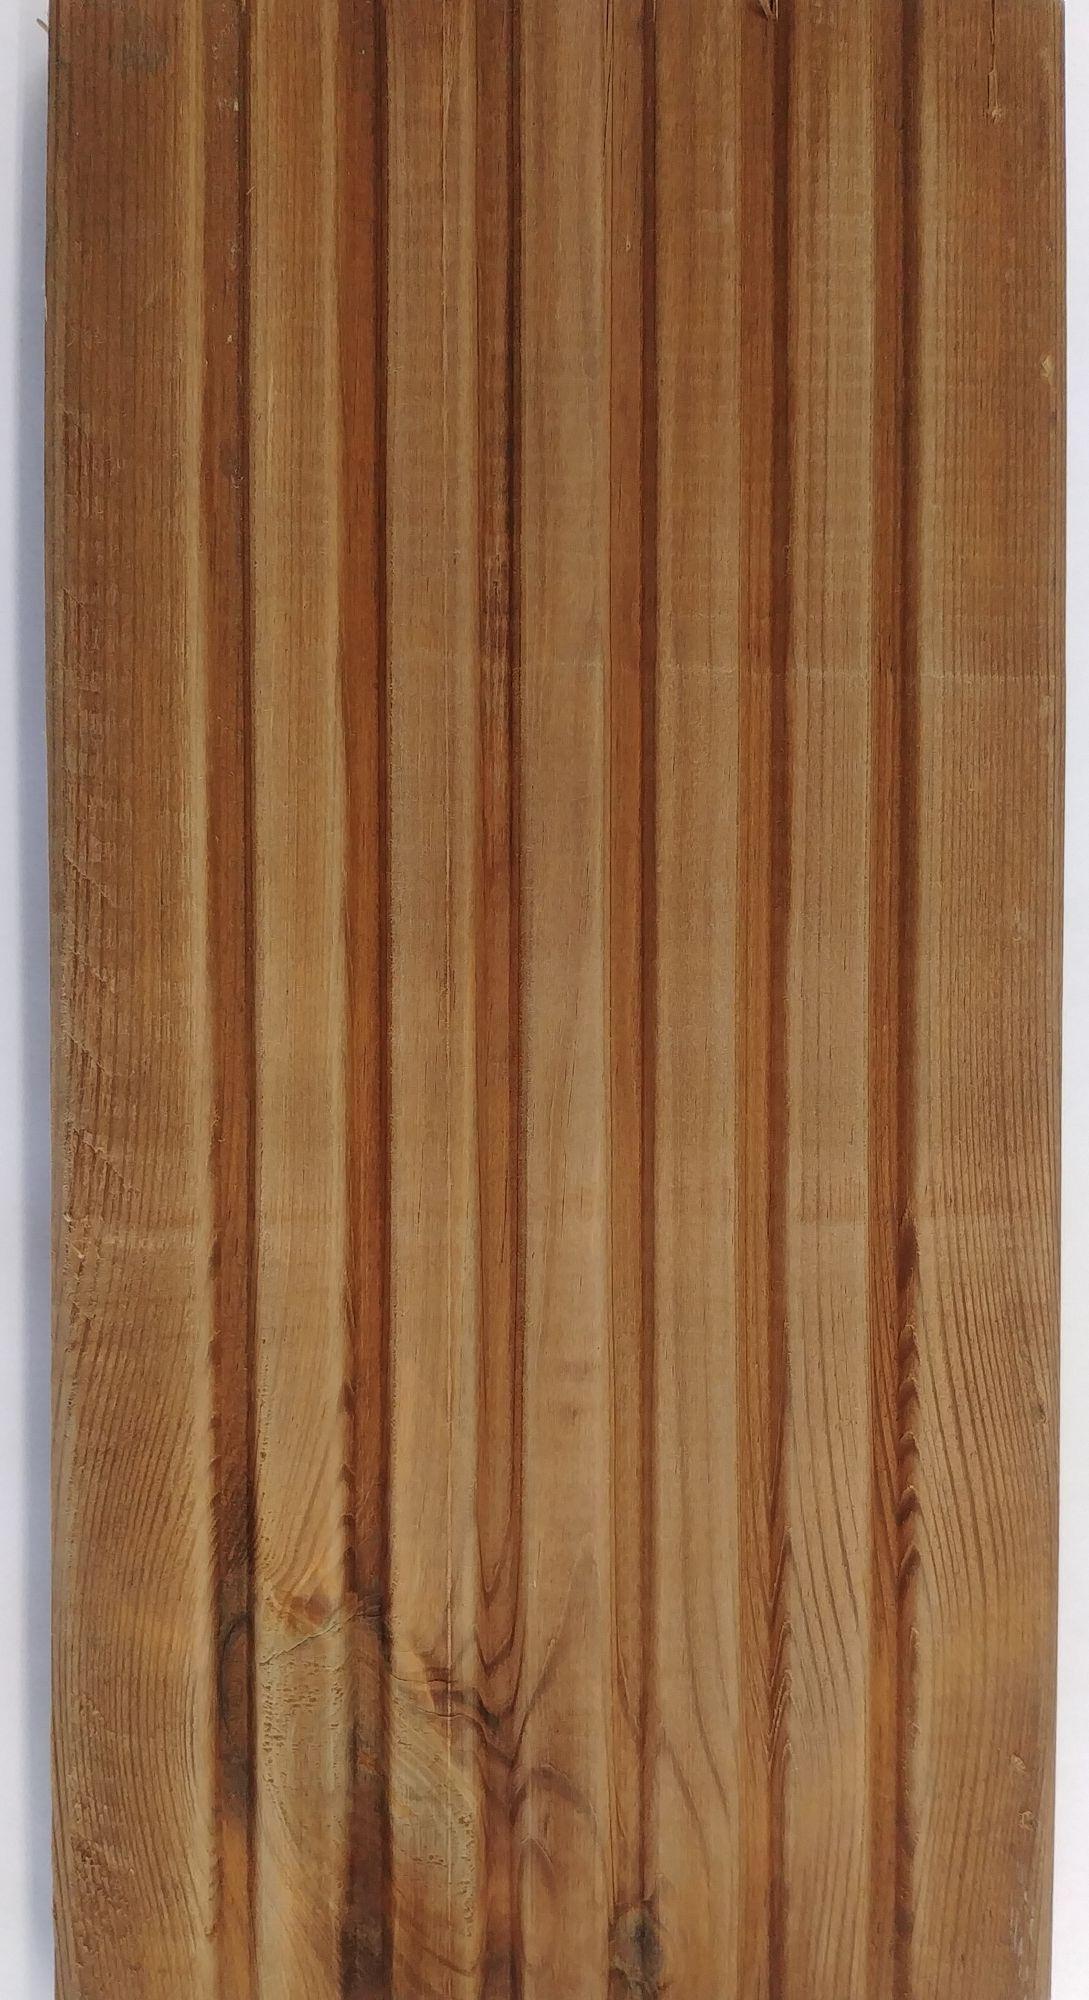 Pieza madera exterior pino tratado r4 marr n 145x28 4 5 metros - Madera de pino para exterior ...